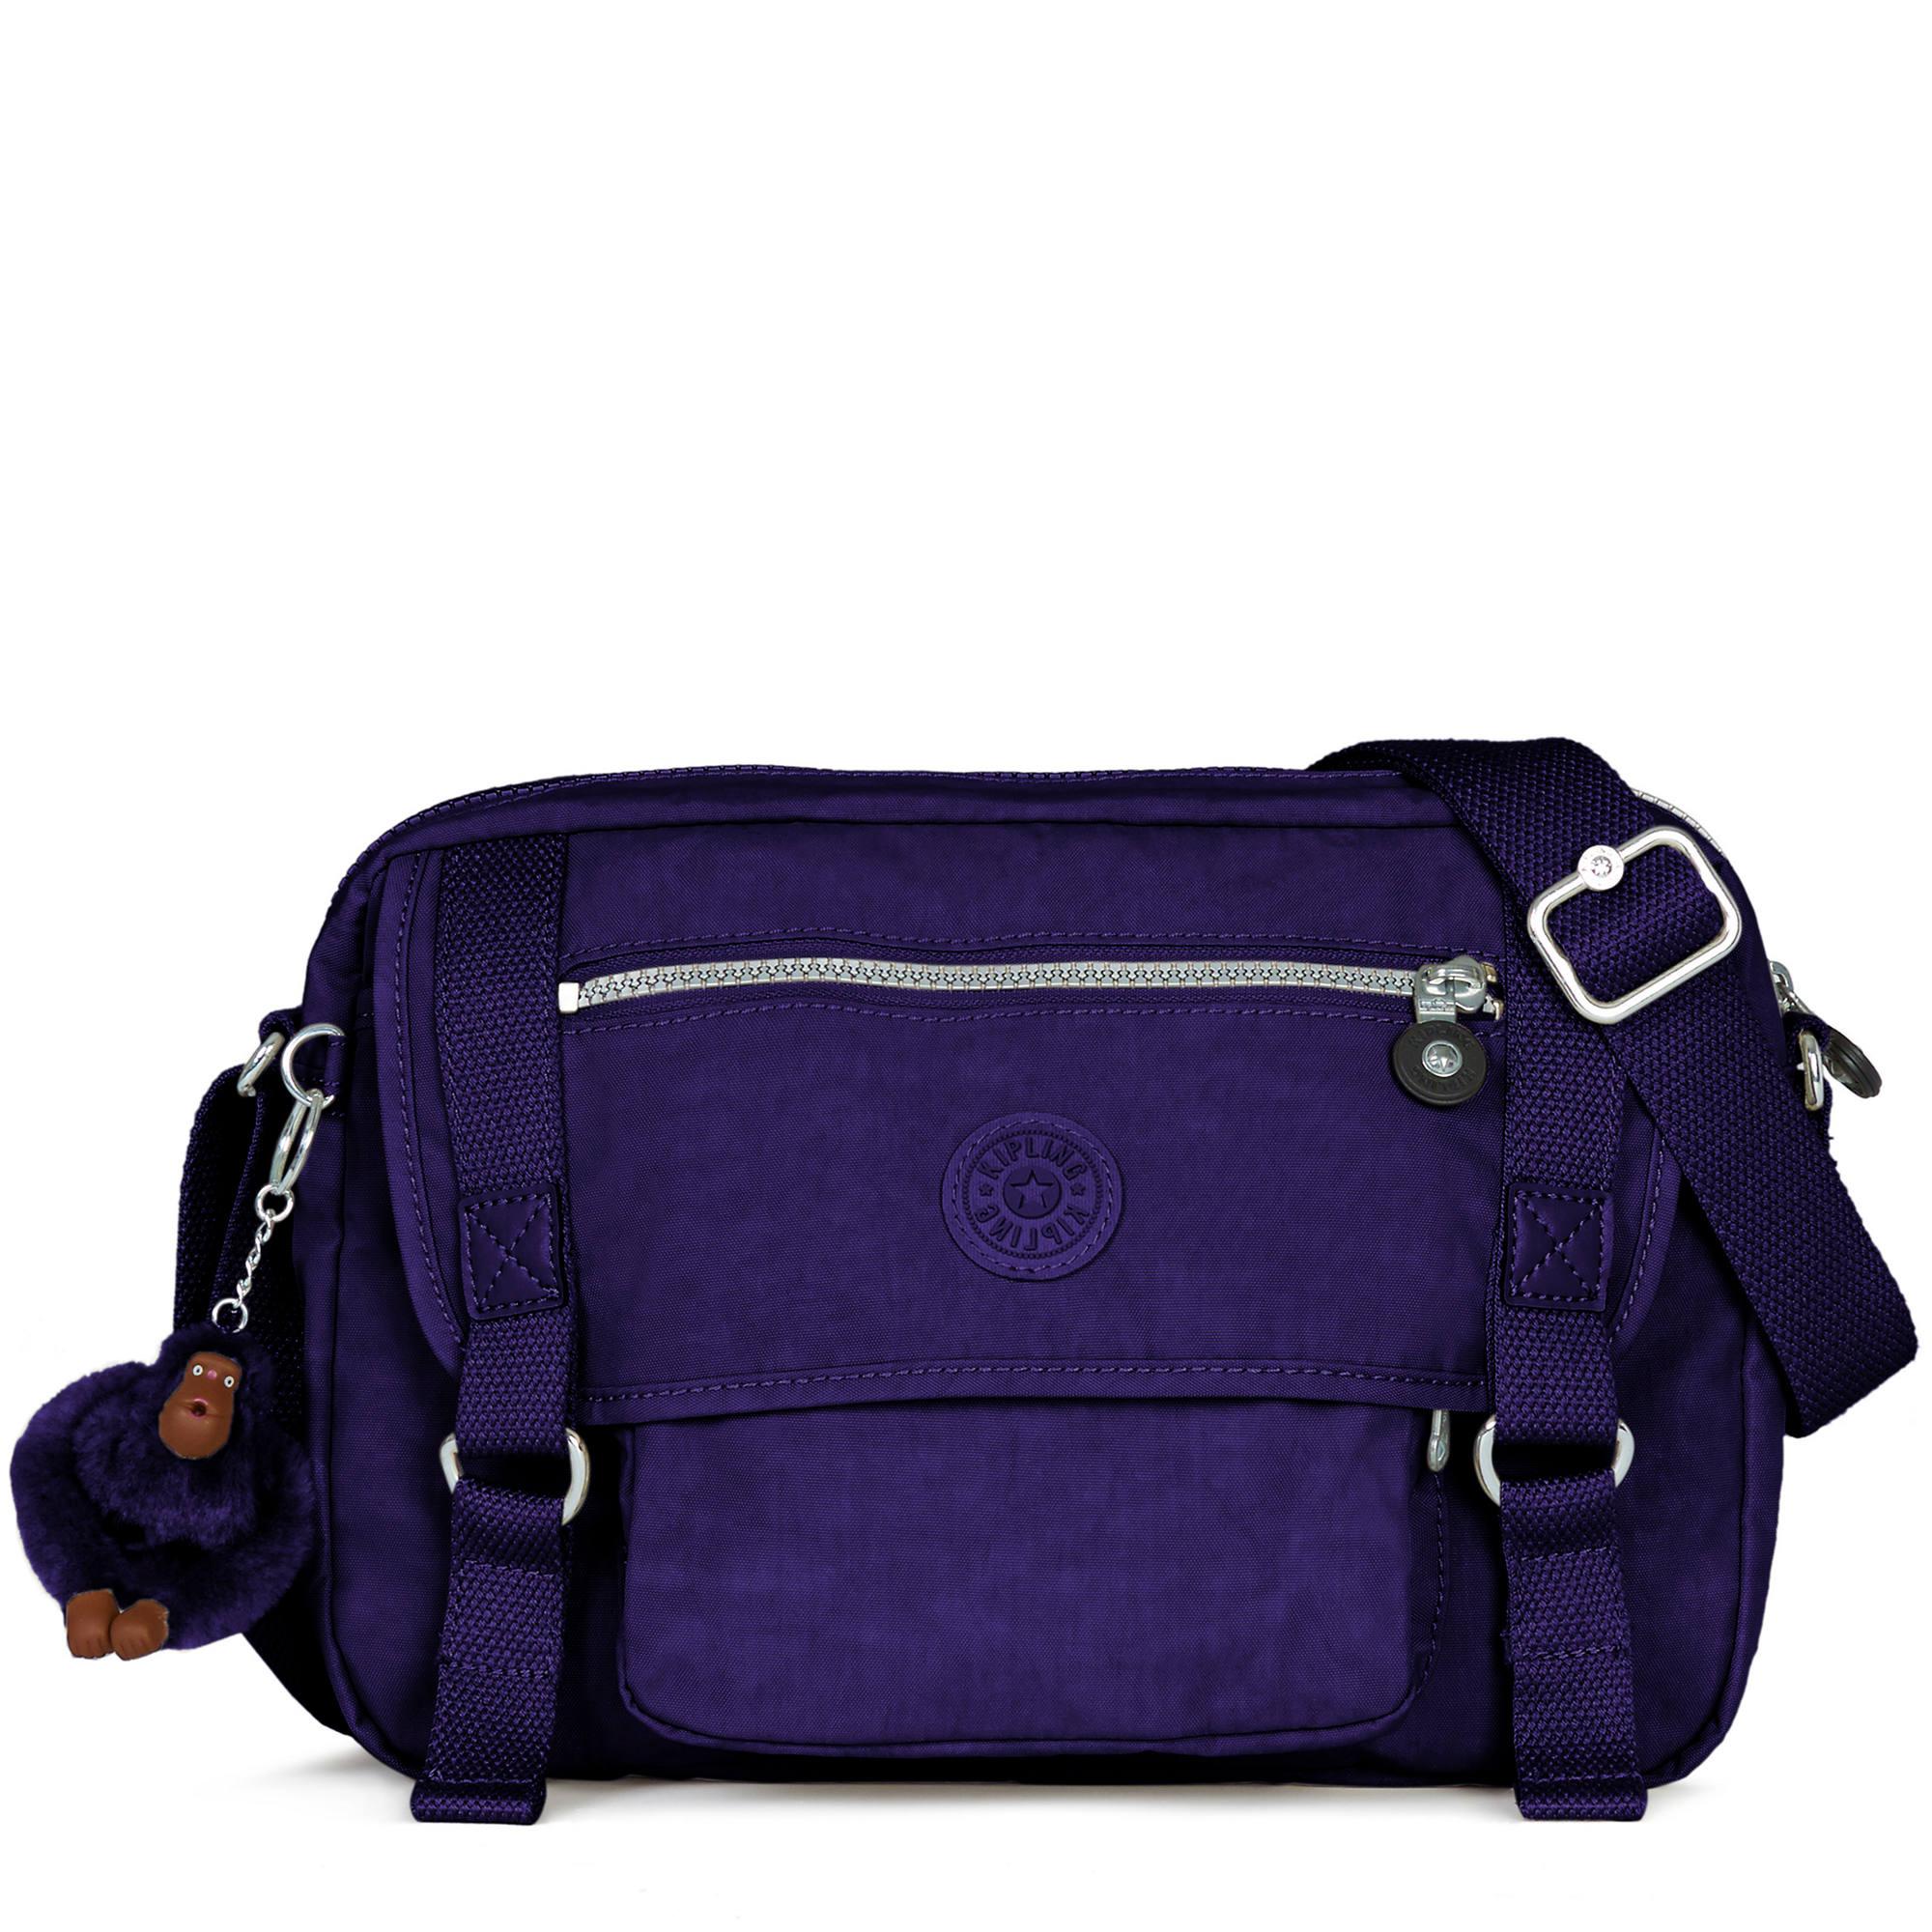 Gracy Crossbody Bag Berry Blue Large